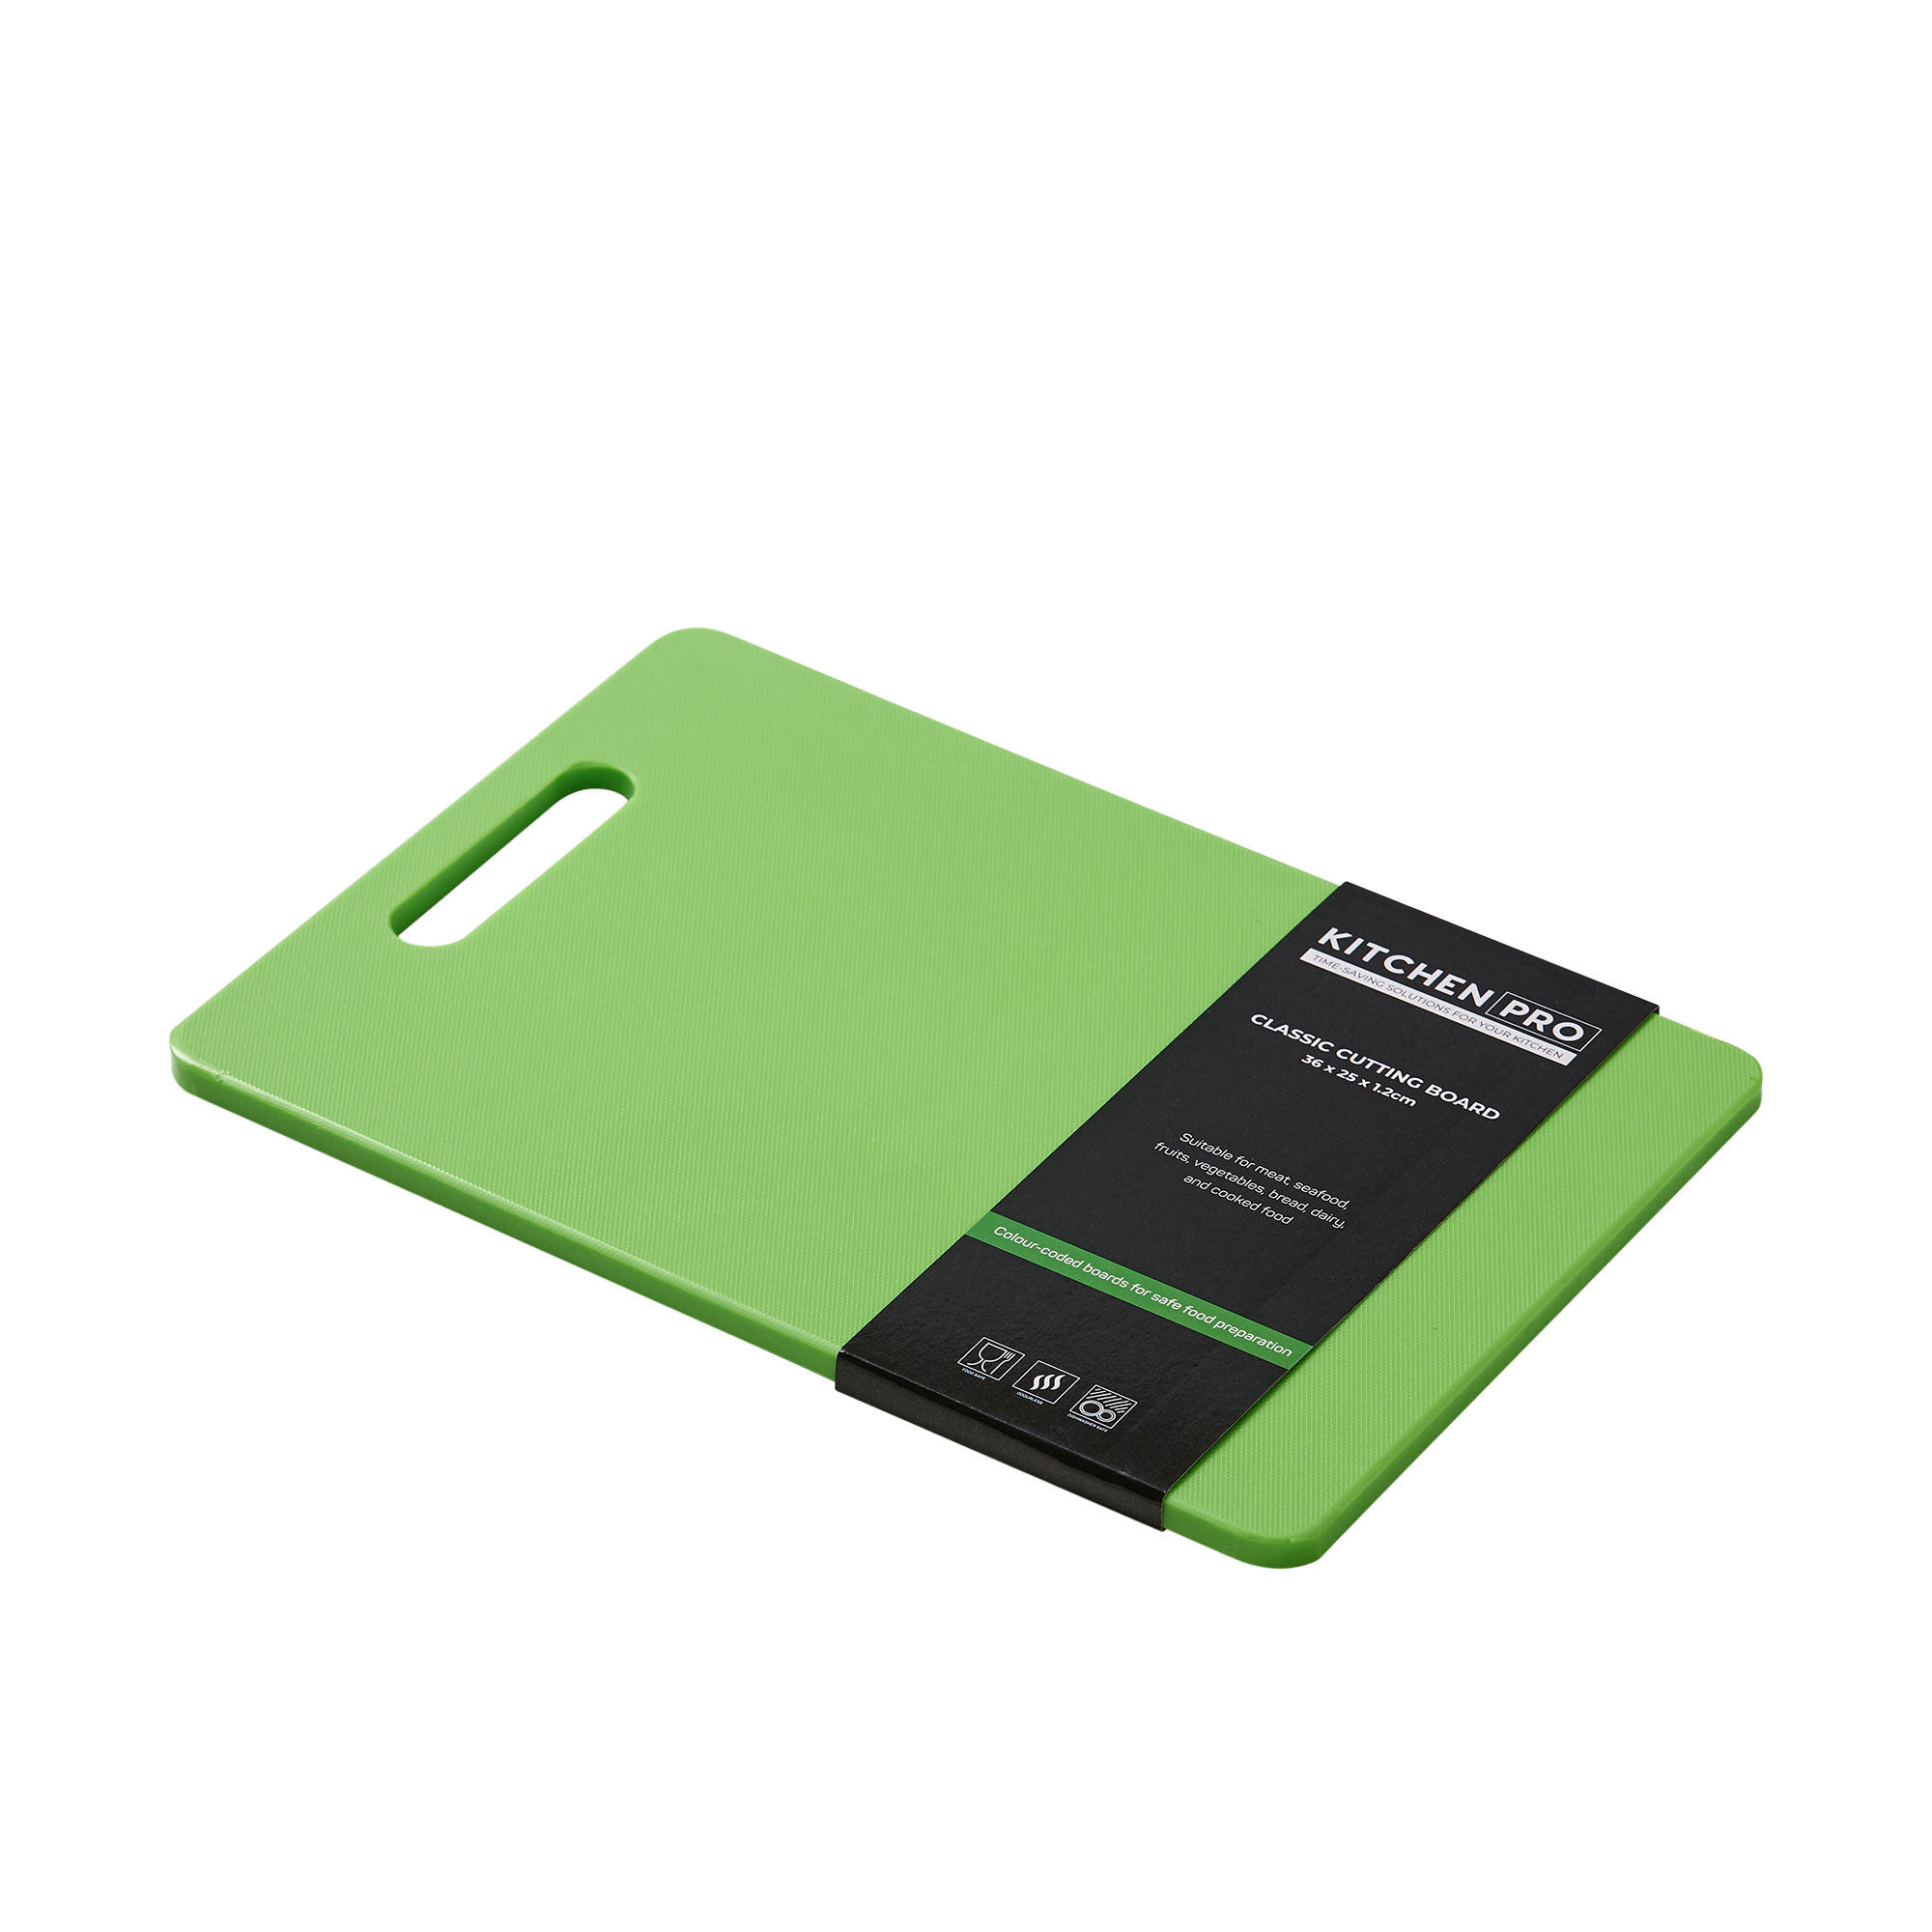 Kitchen Pro Classic Cutting Board 36x25x1.2cm Green image #2